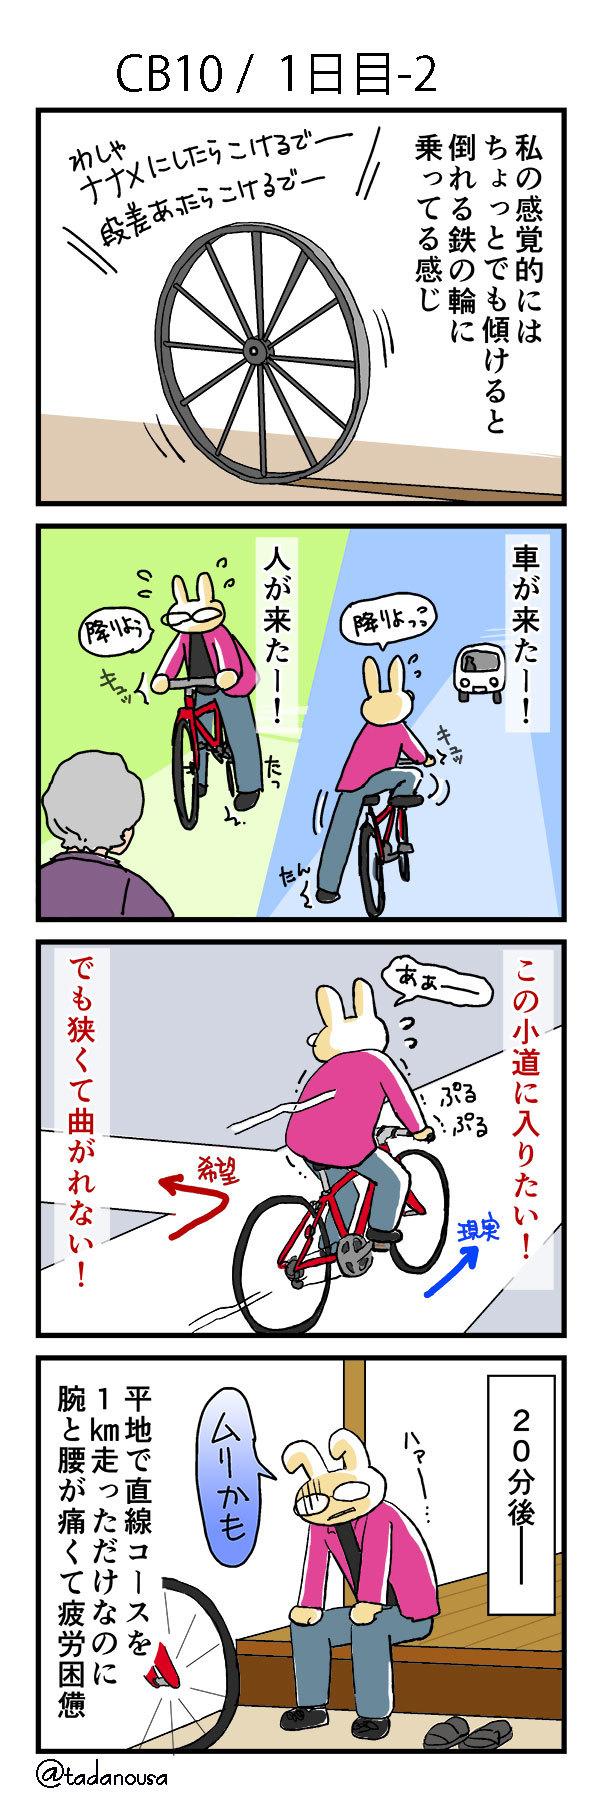 bike_4koma_kako050_s.jpg